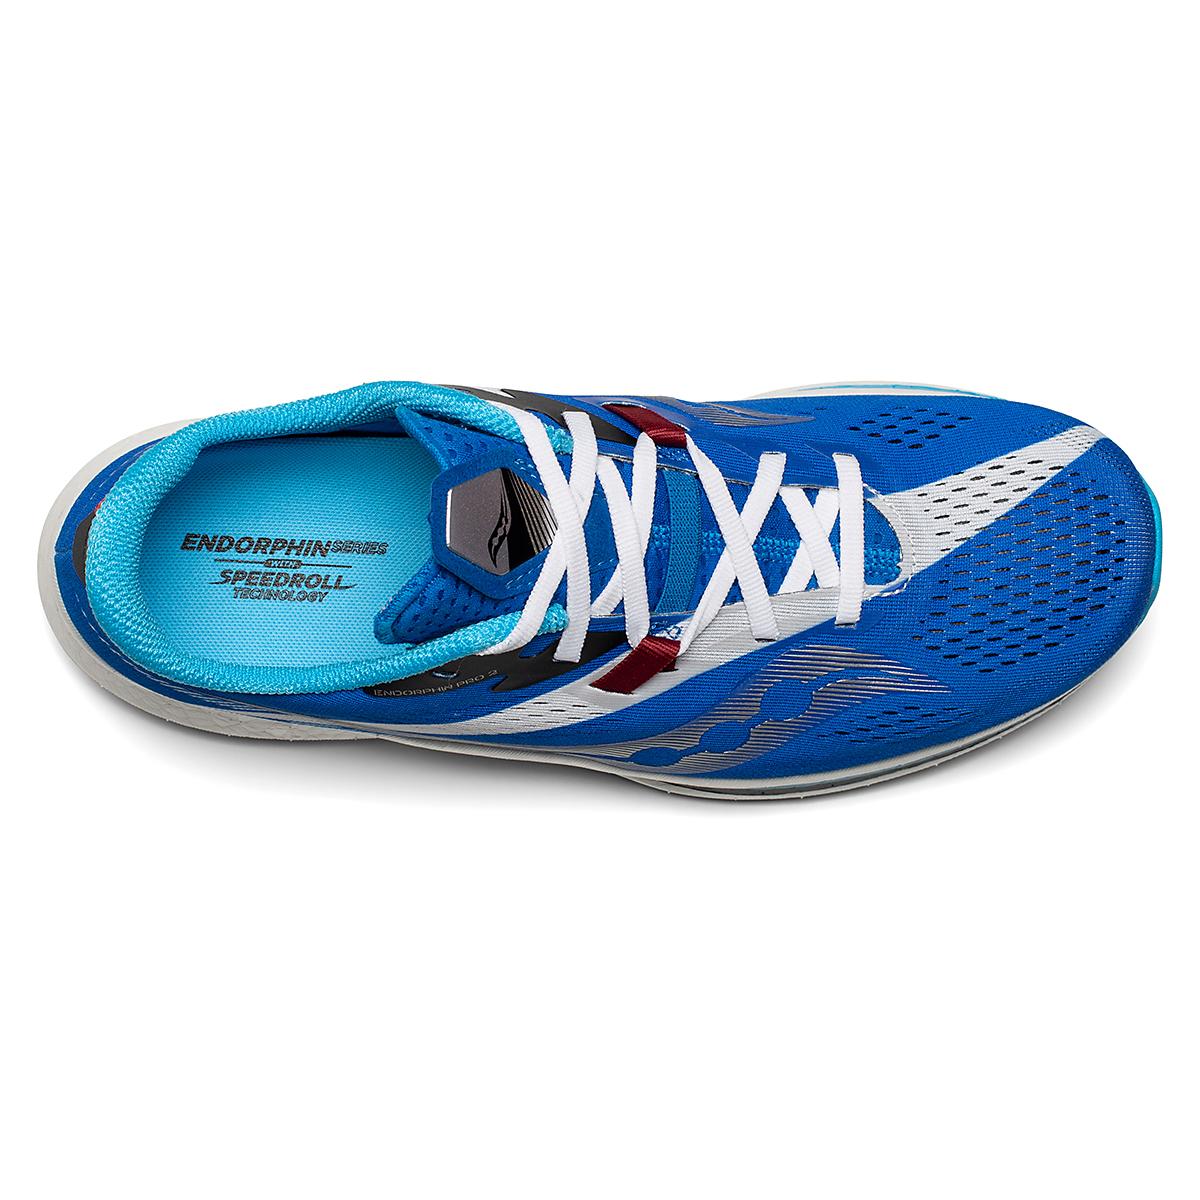 Men's Saucony Endorphin Pro 2 Running Shoe - Color: Royal/White - Size: 7 - Width: Regular, Royal/White, large, image 3